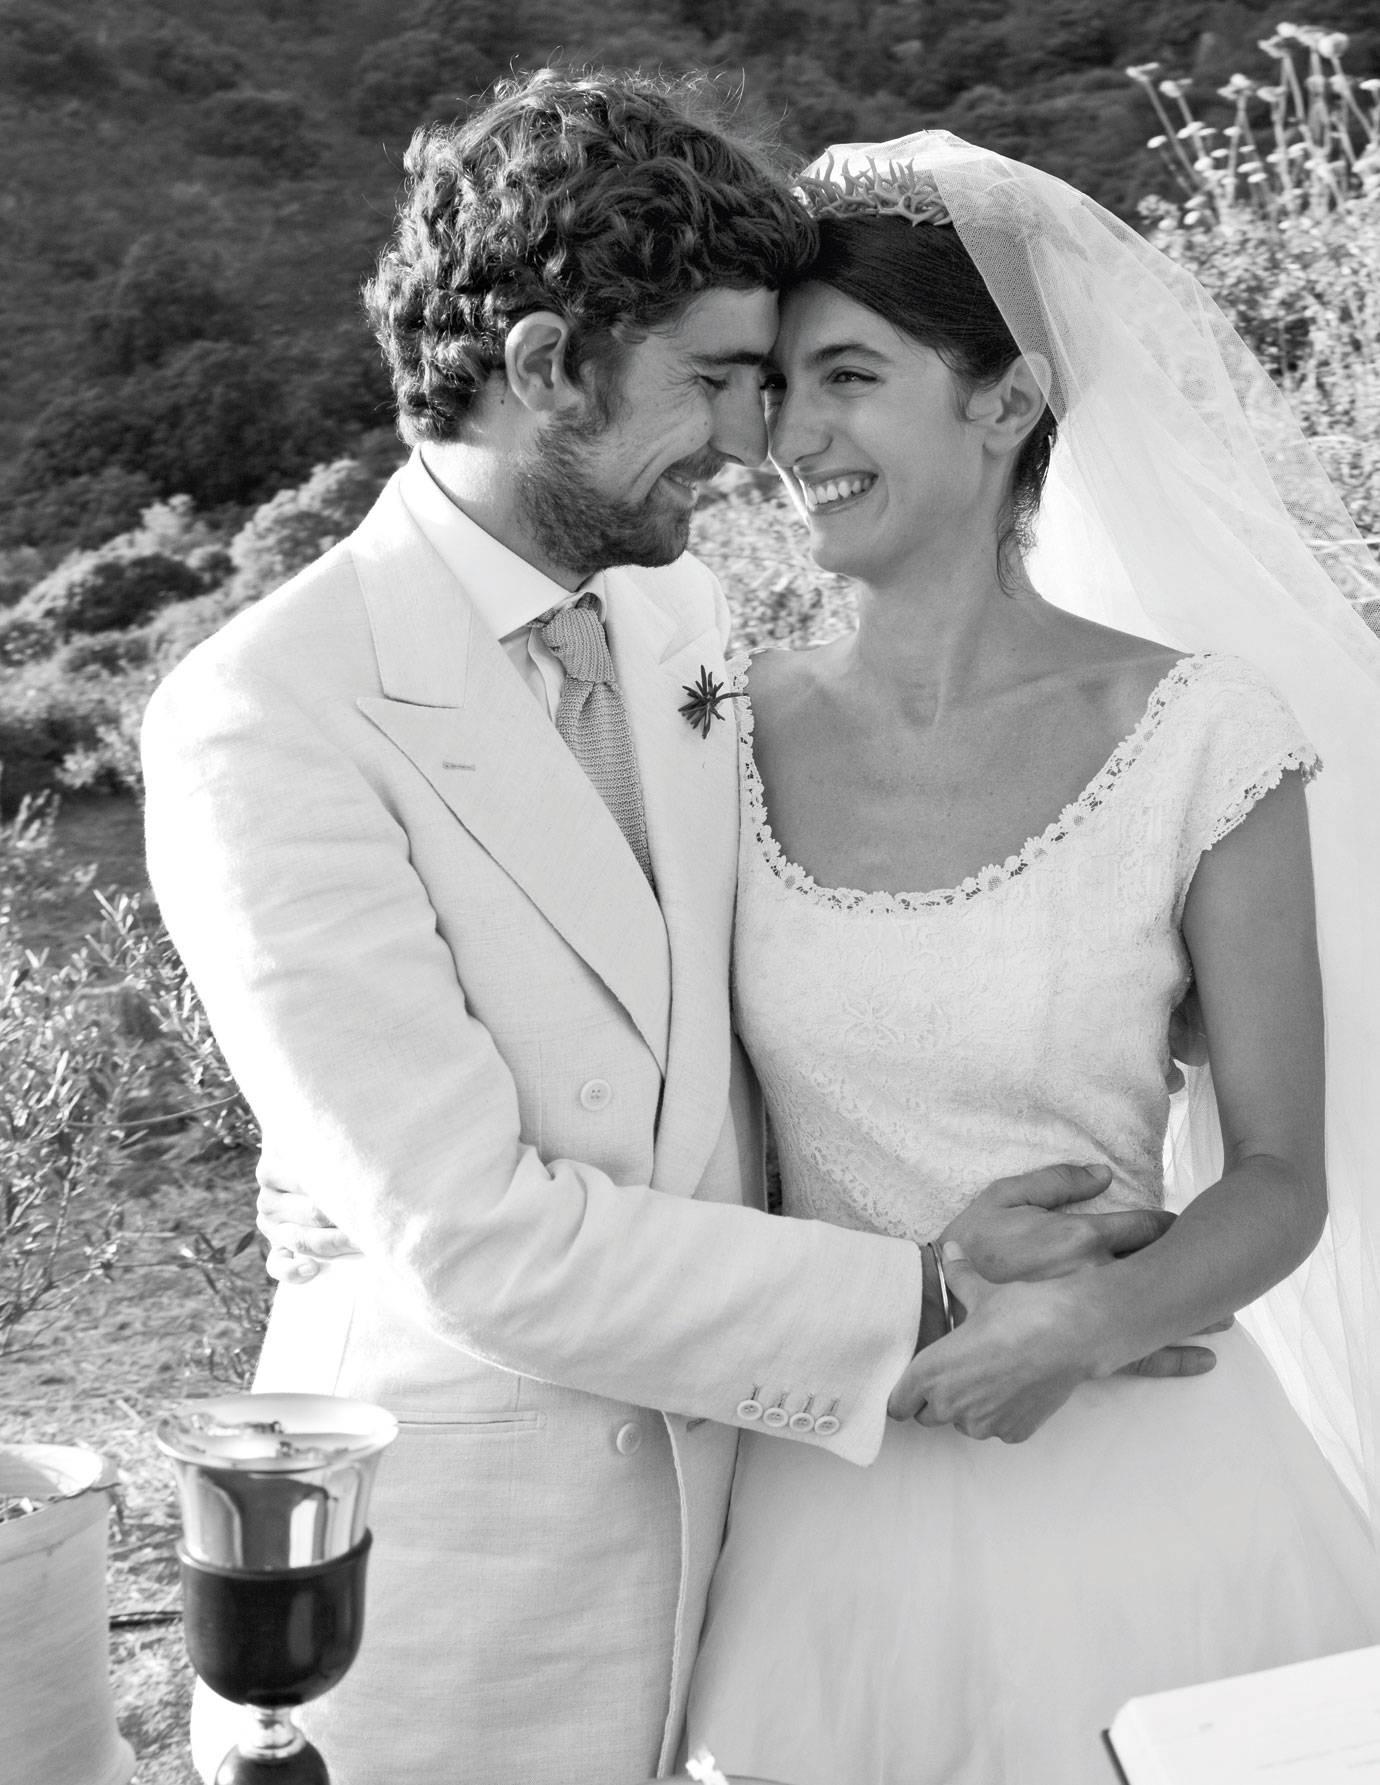 marta ferri and carlo borrmoeo wedding pantelleria italy